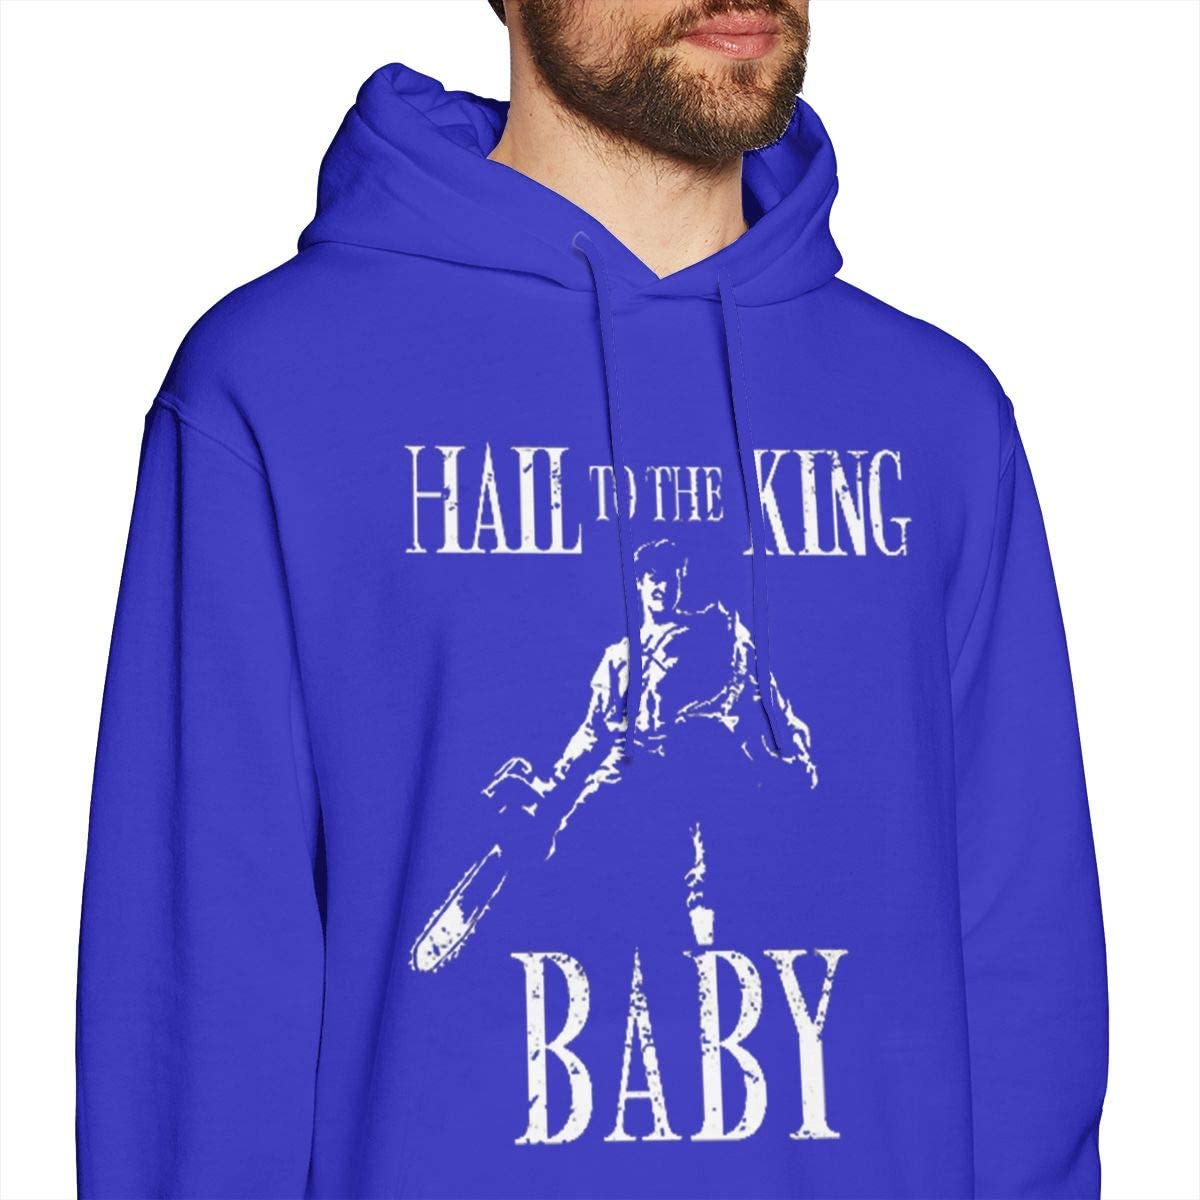 JiaoZhiduanxiu Mens Hail-to-The-King-Baby Leisure Blue Hoodie Sweatshirt Jacket Pullover Tops